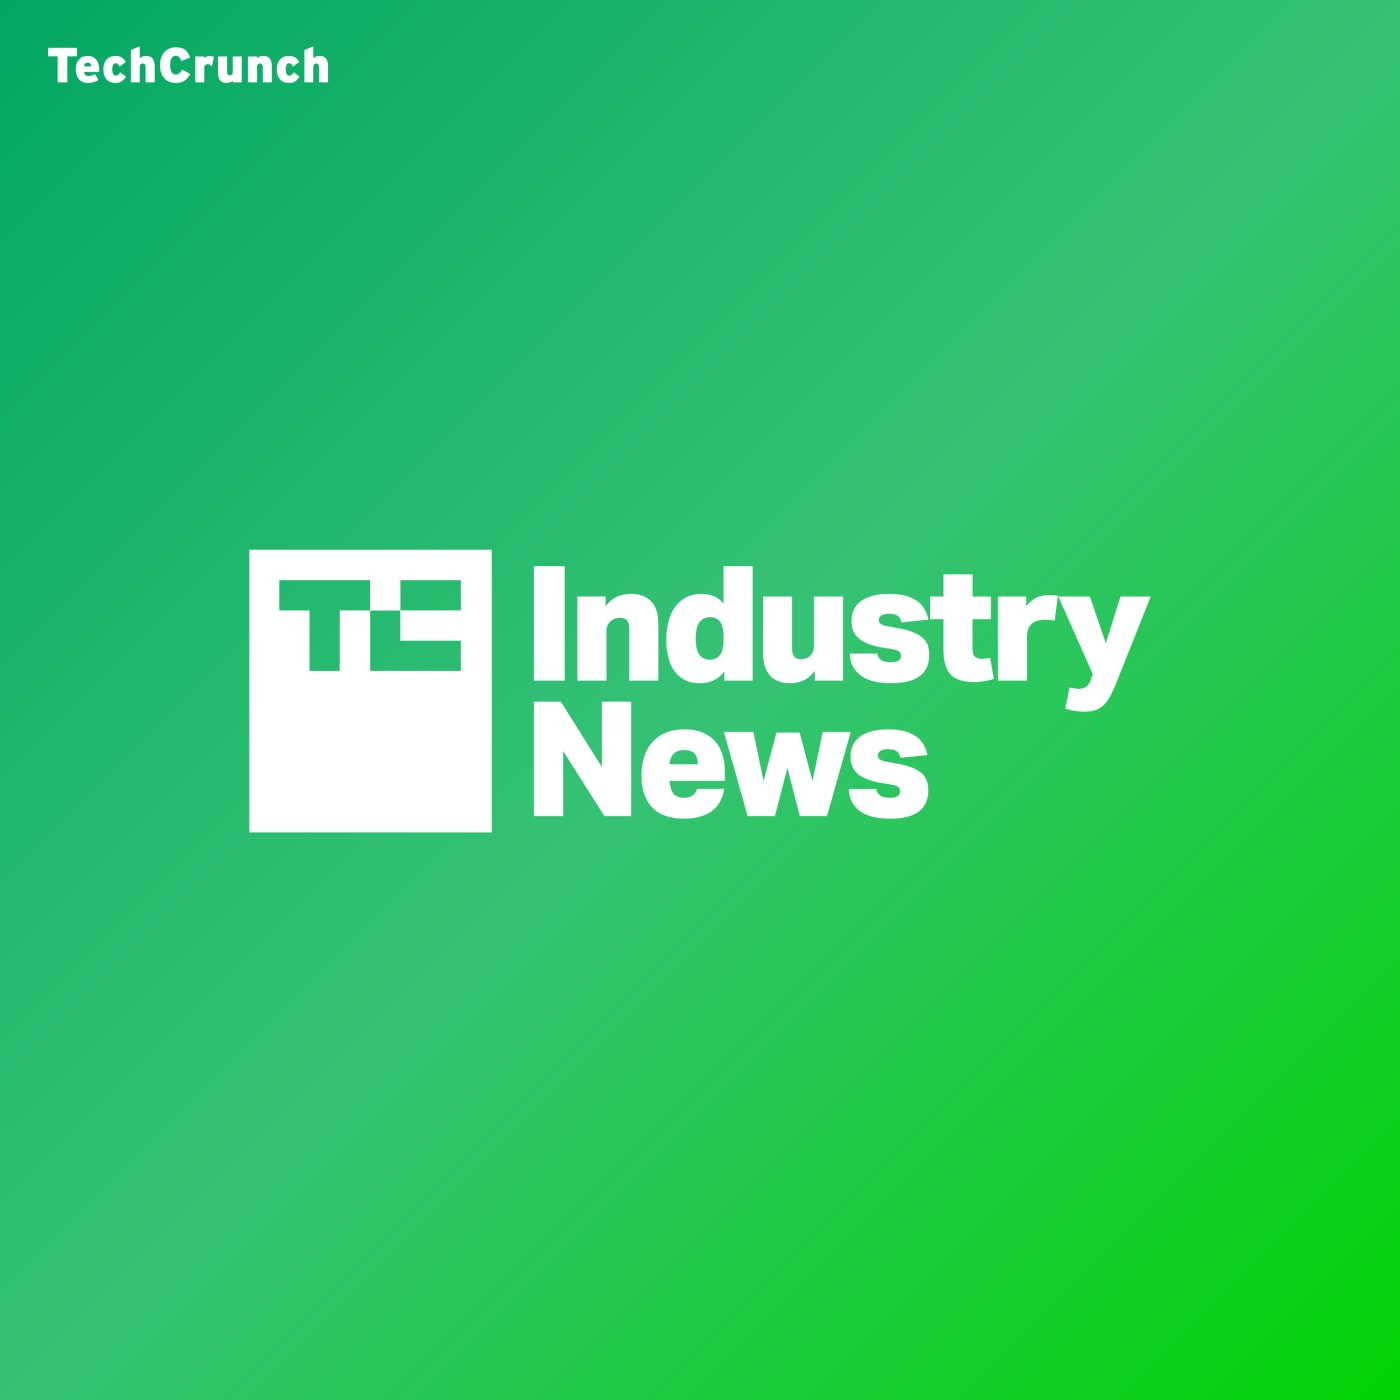 TechCrunch Industry News